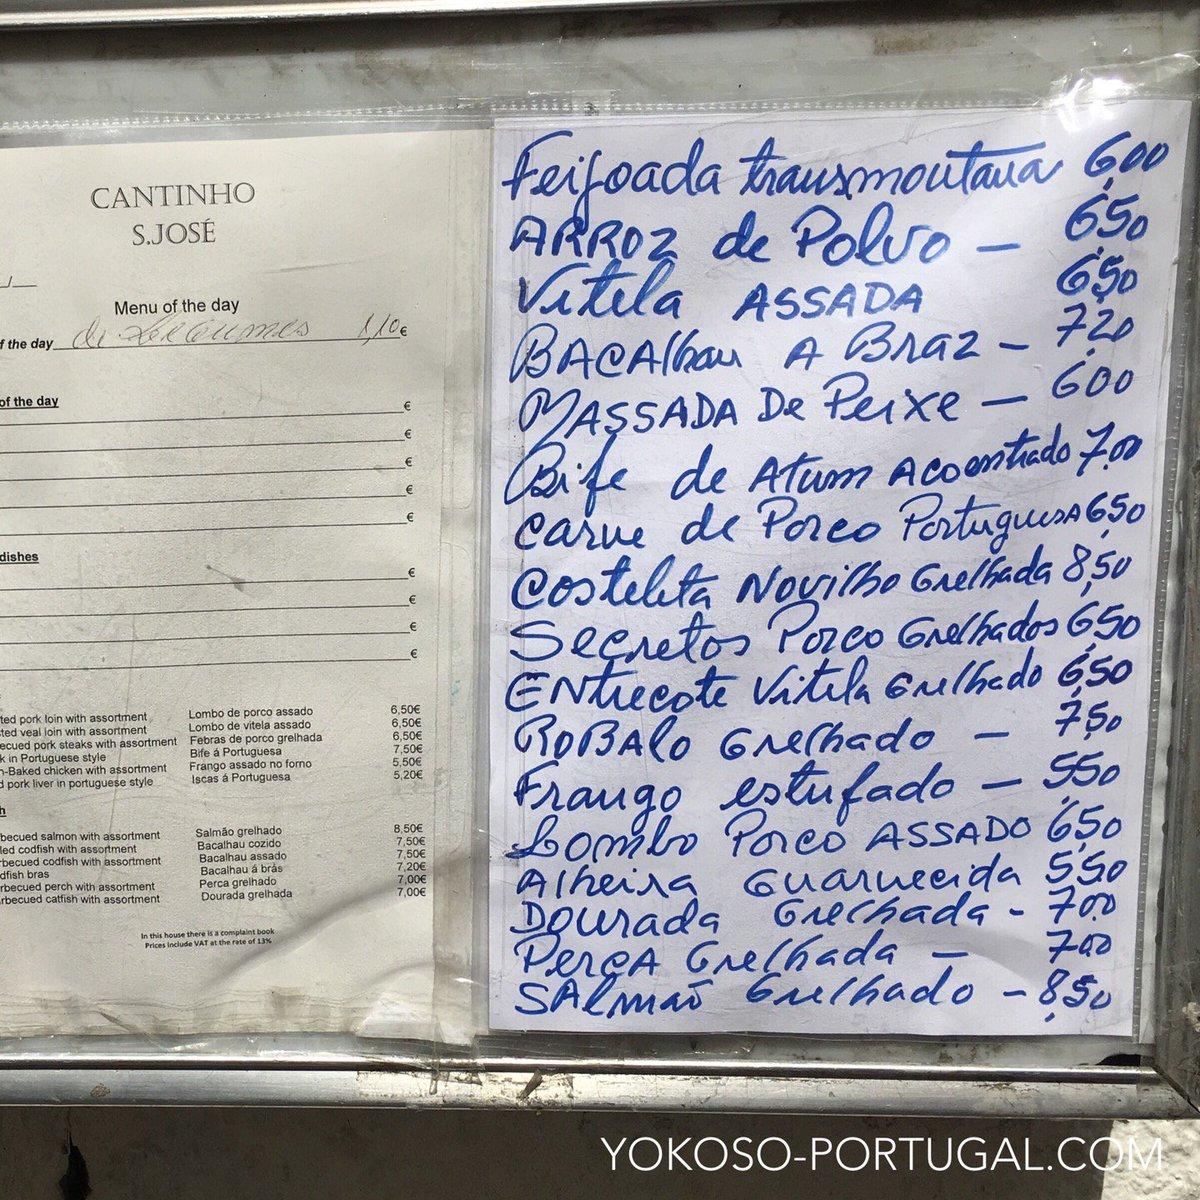 test ツイッターメディア - ローカルの民でいつも賑わっている食堂。安くて旨い、リスボンのロシオ広場から徒歩5分ほど。 (@ Cantinho São José in Lisboa) https://t.co/AXSAhiOnJ9 https://t.co/SDaAoMGQQD